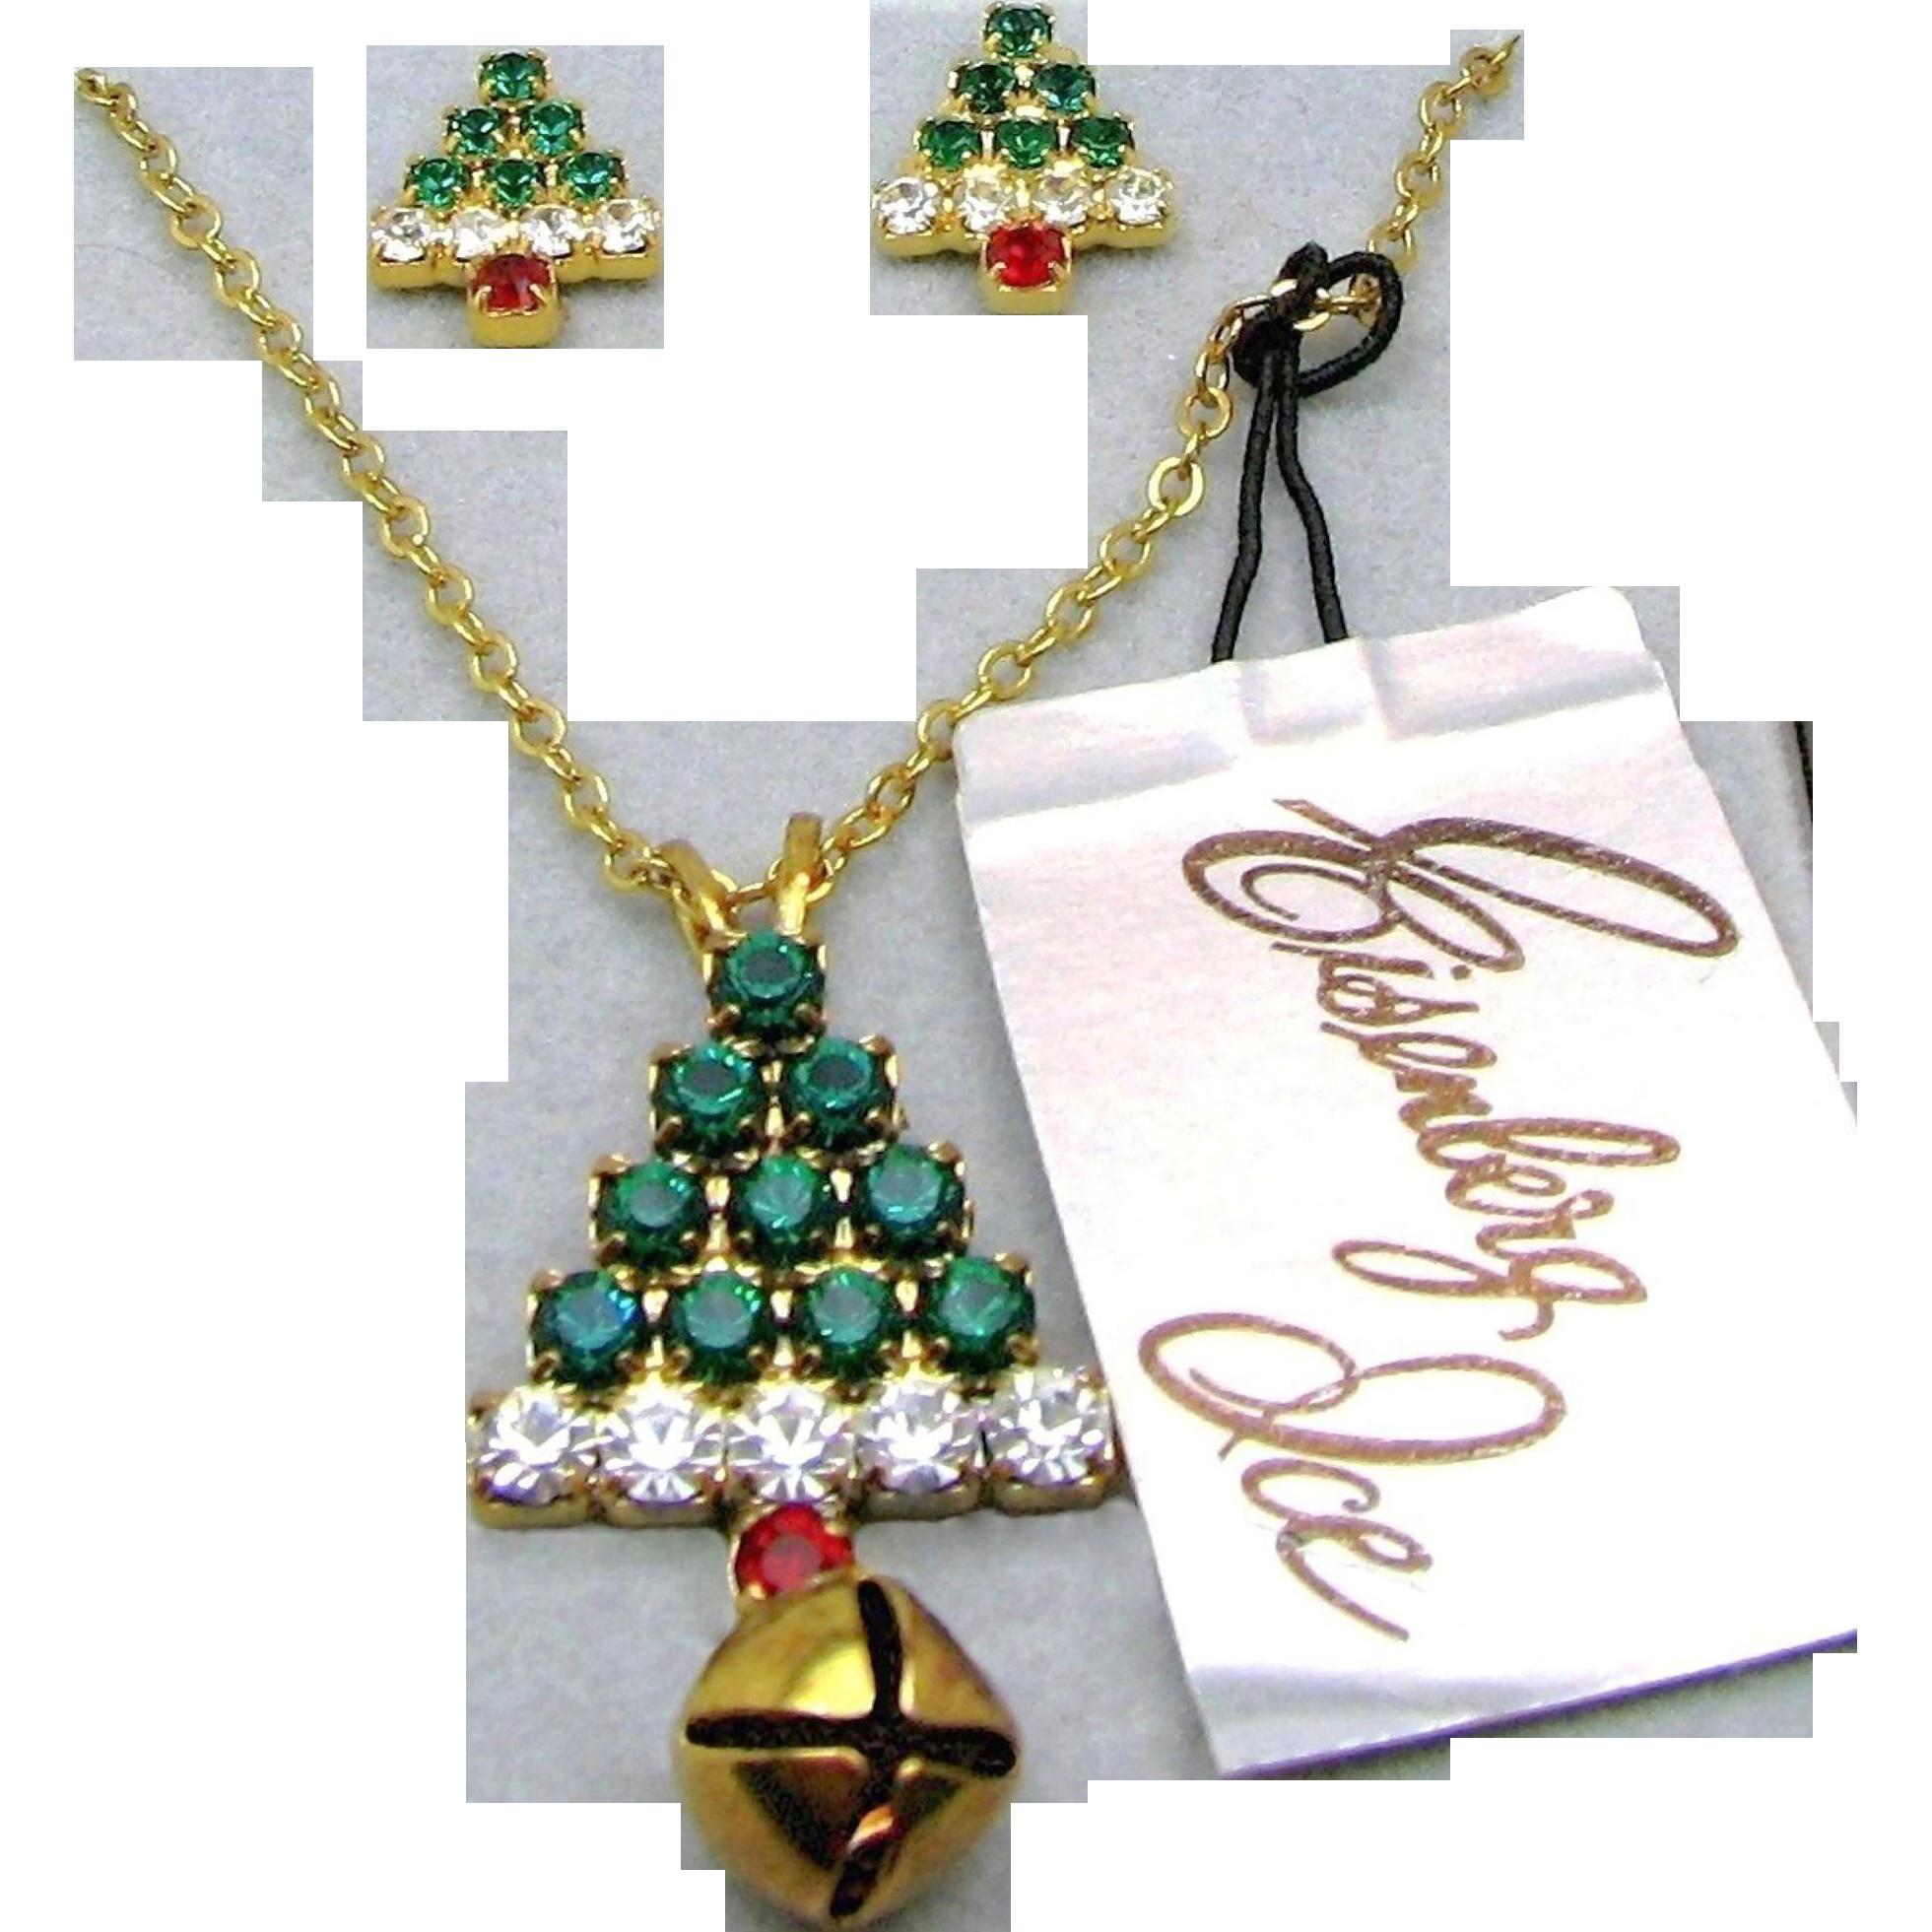 EISENBERG ICE Red 'n Green Rhinestone Christmas Tree Necklace w/ Earrings Orig. Box